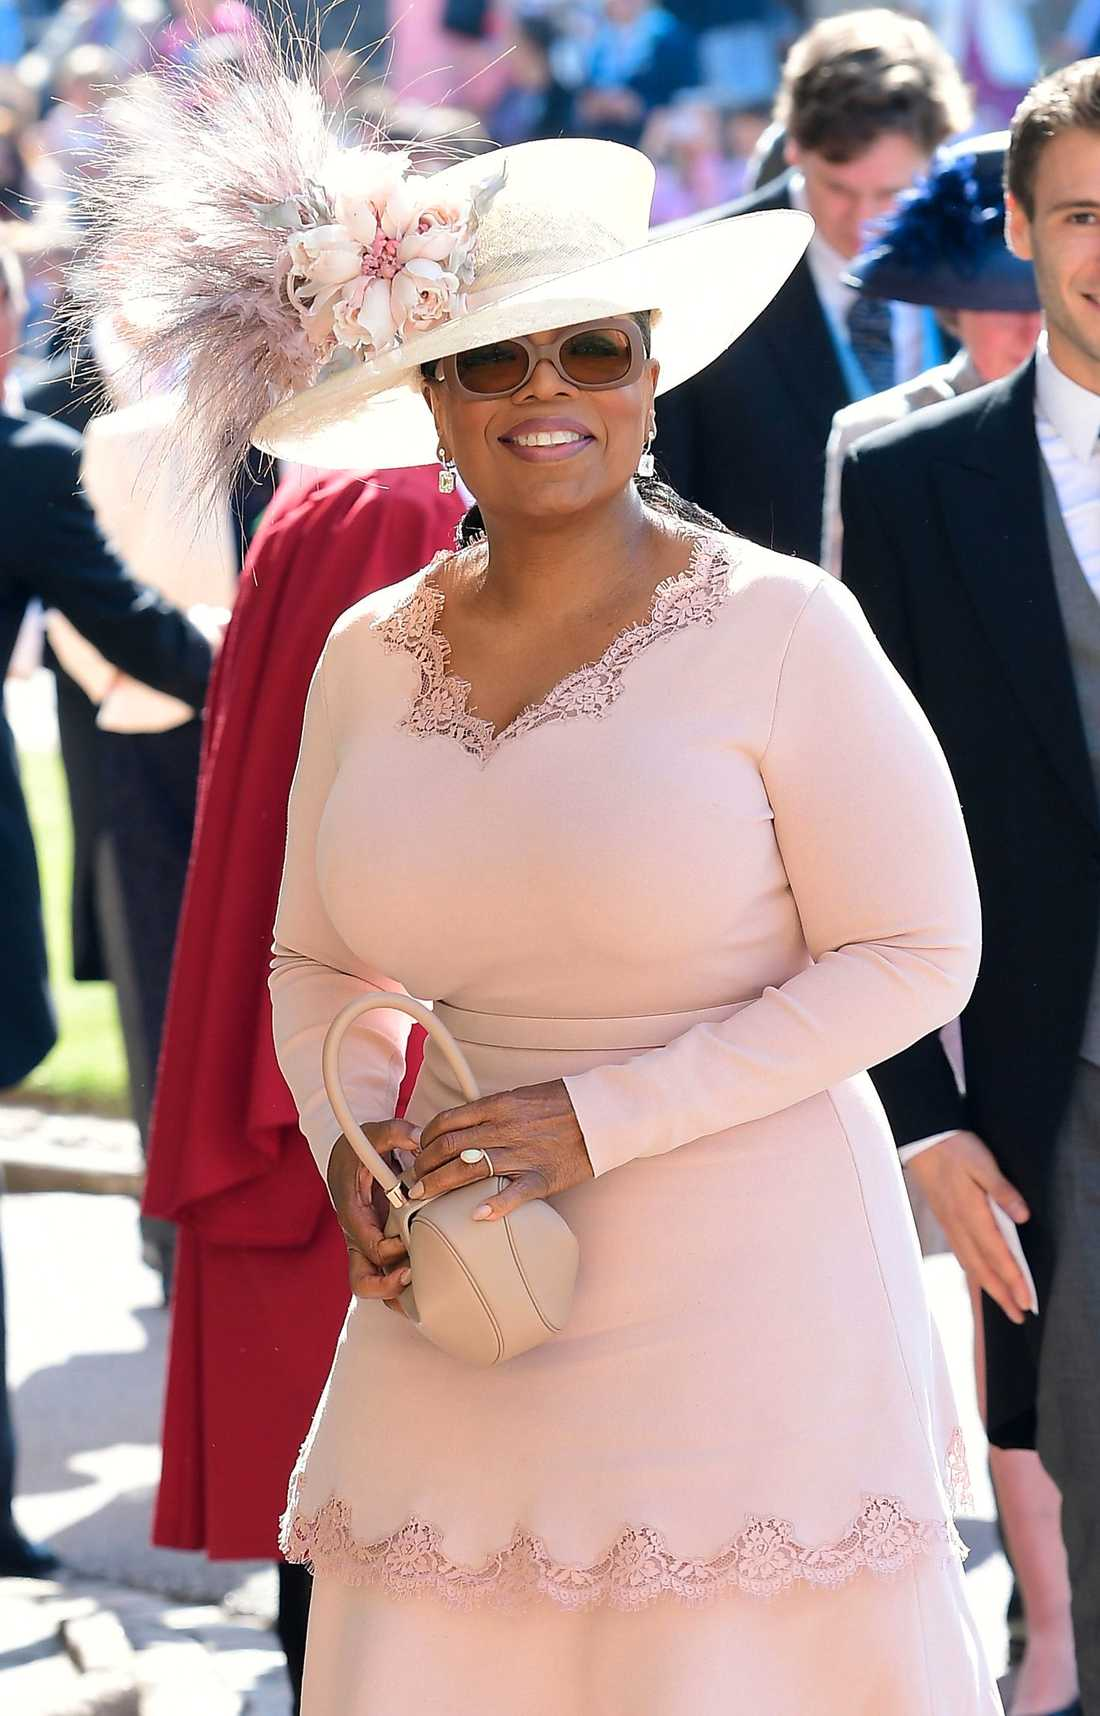 Oprah Winfrey anländer till St George's Chapel